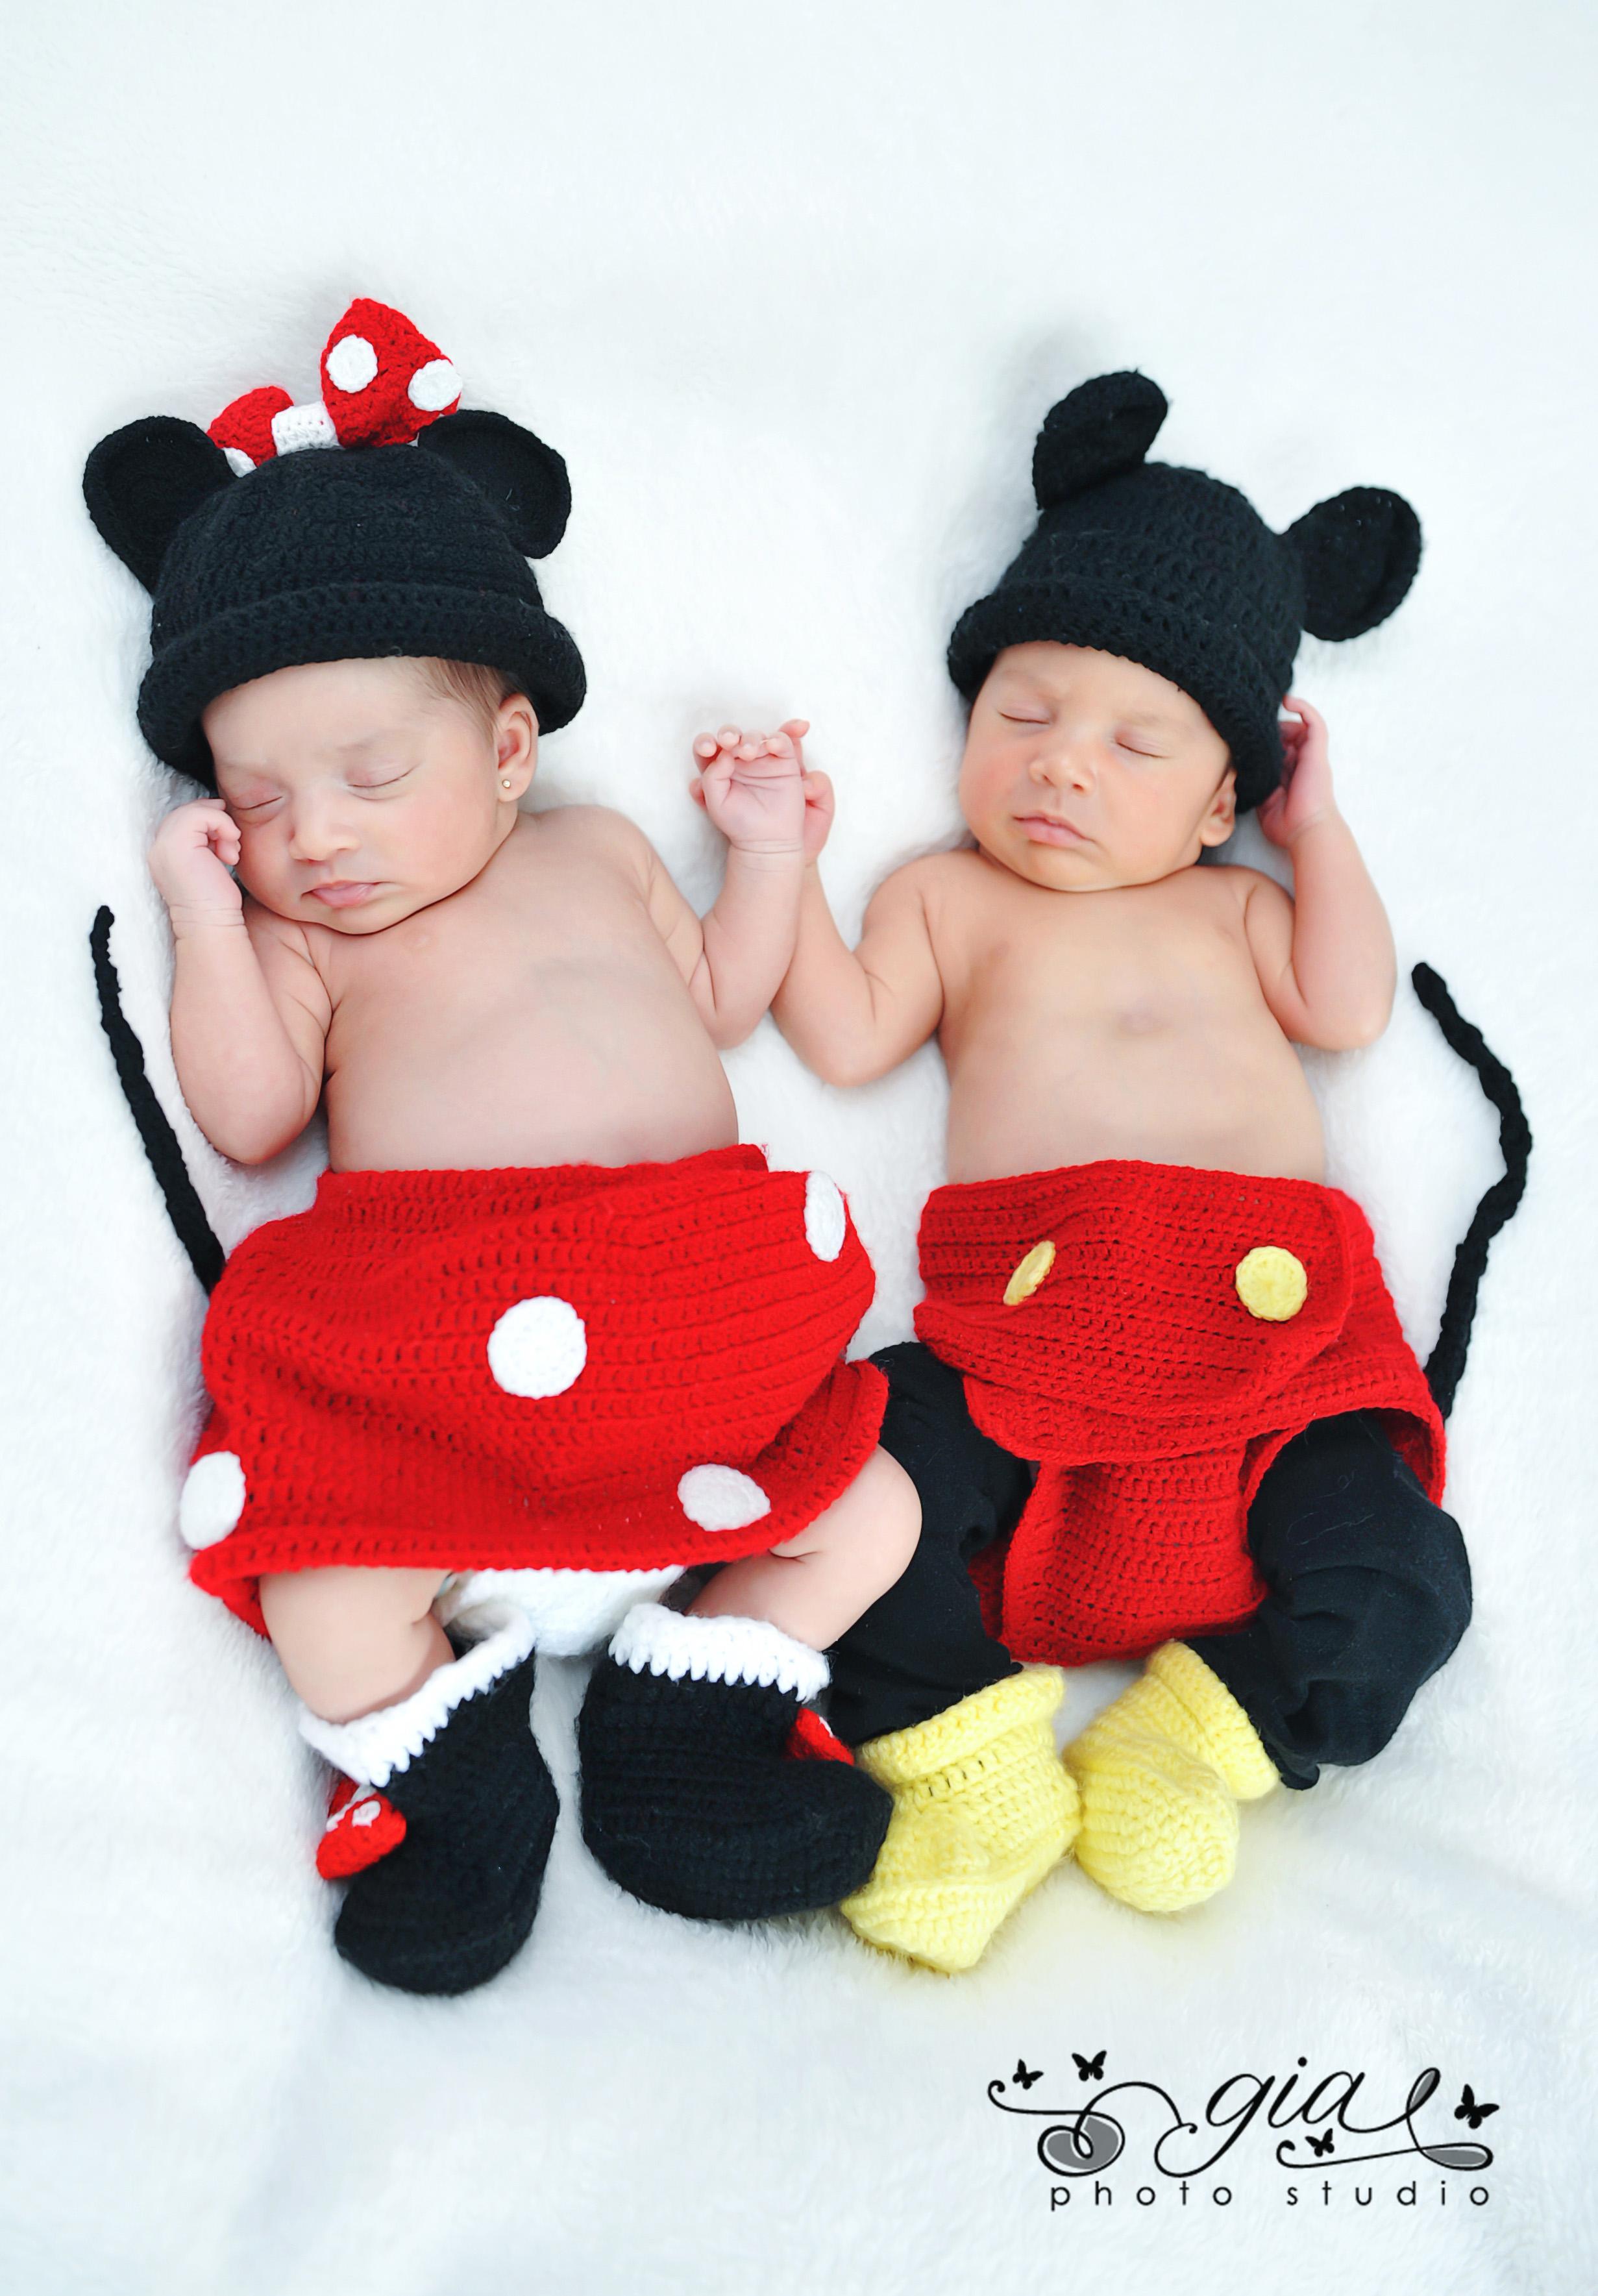 poze-cu-bebelusi-nou-nascuti-15